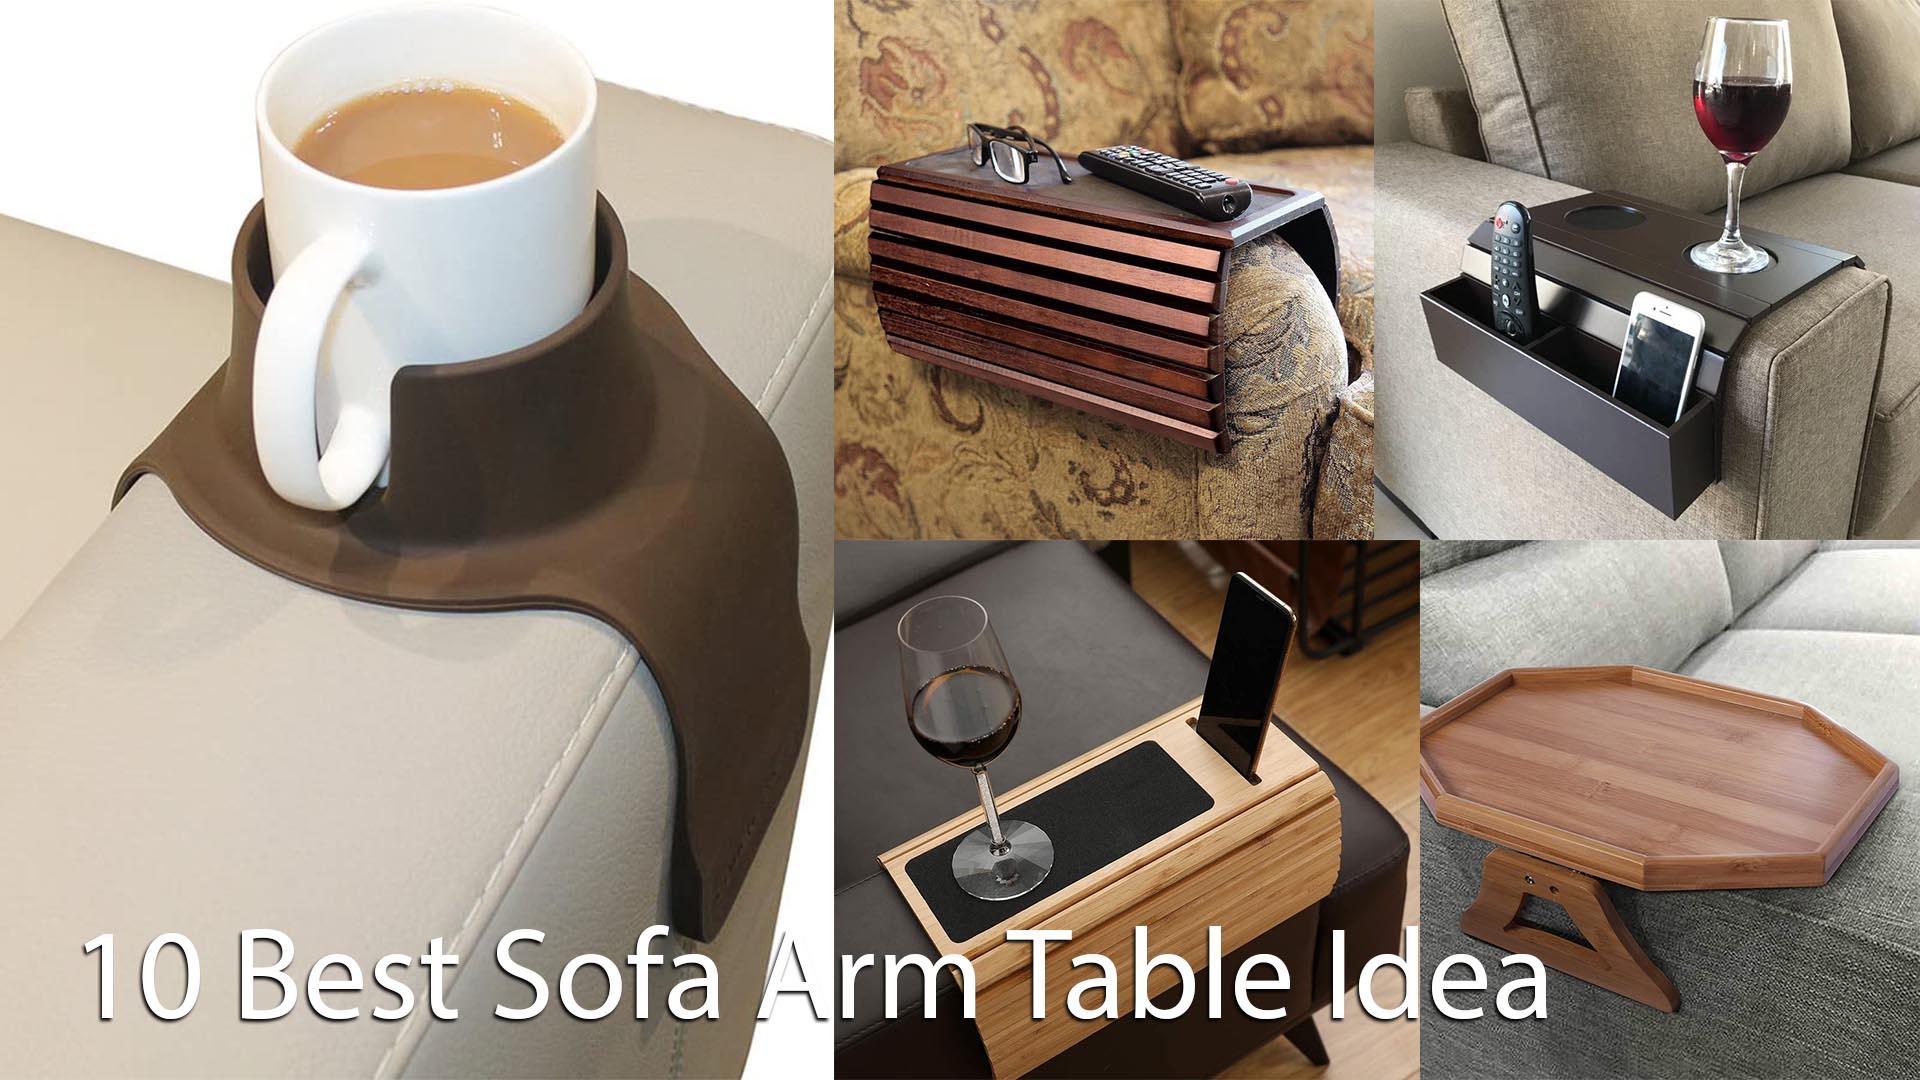 Best Sofa Arm Table Idea For Living Room